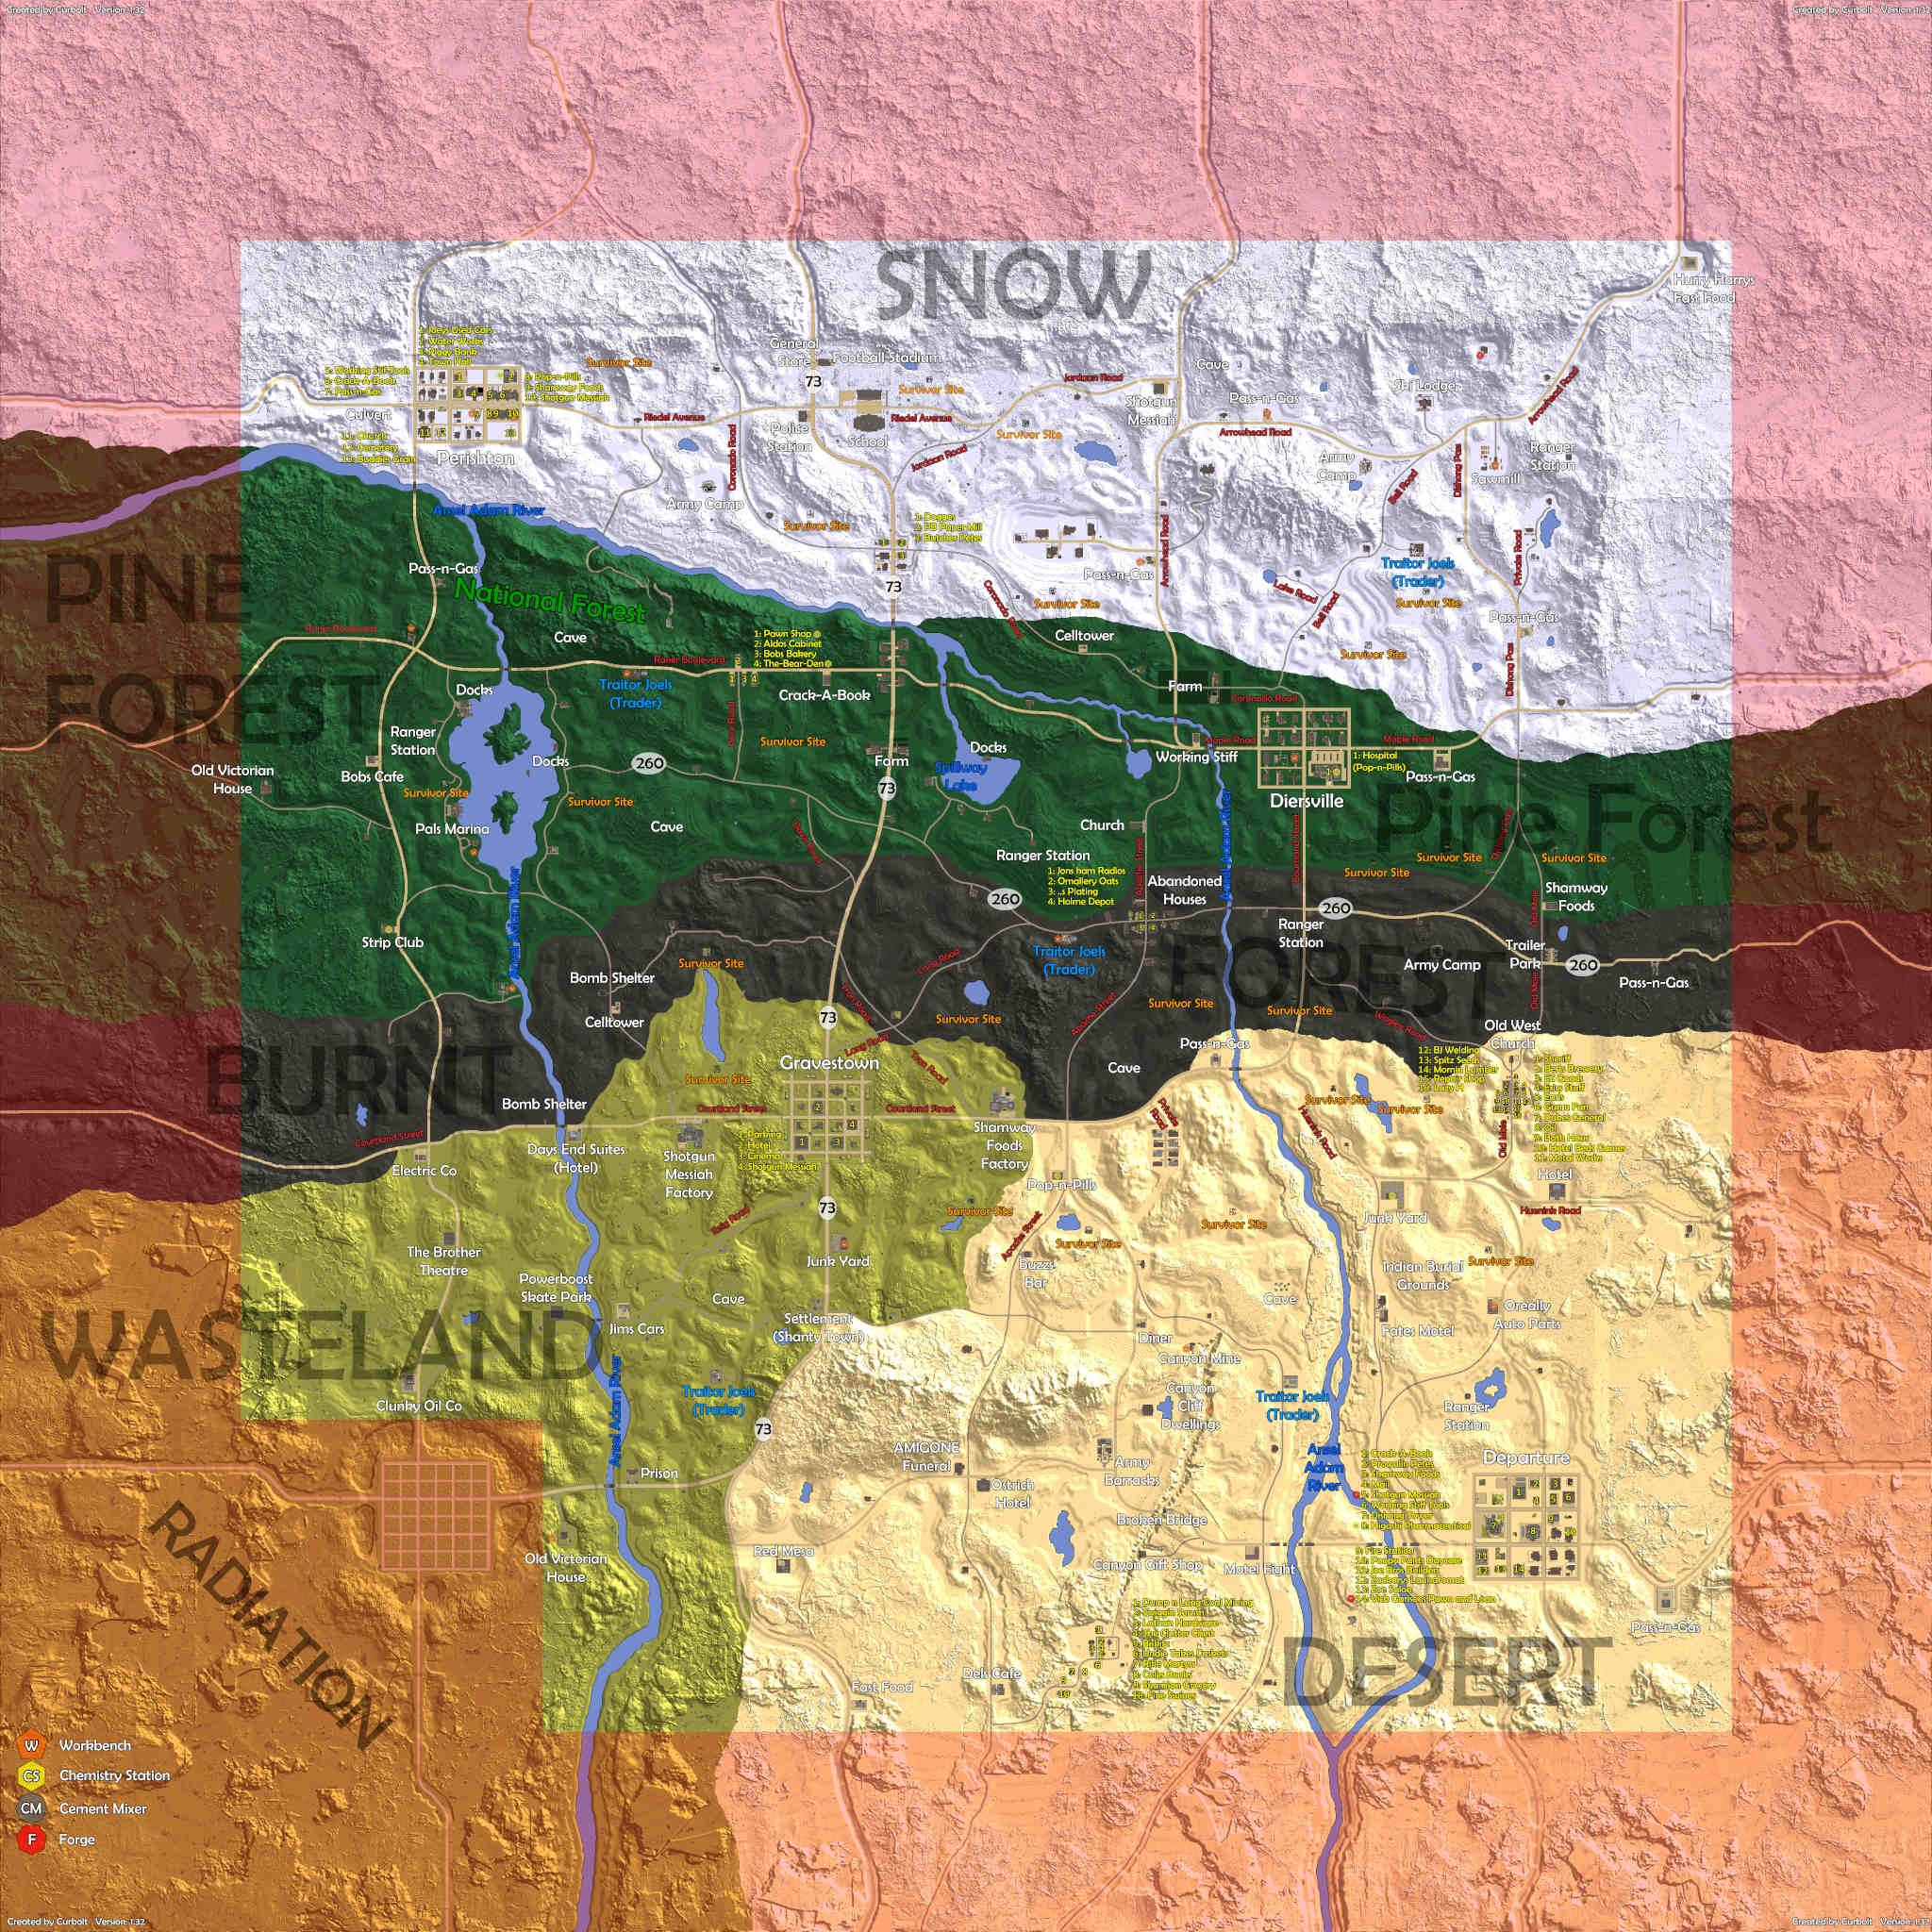 Navezgane_A18_Full_Map_Names_Roads_by_Curbolt.jpg